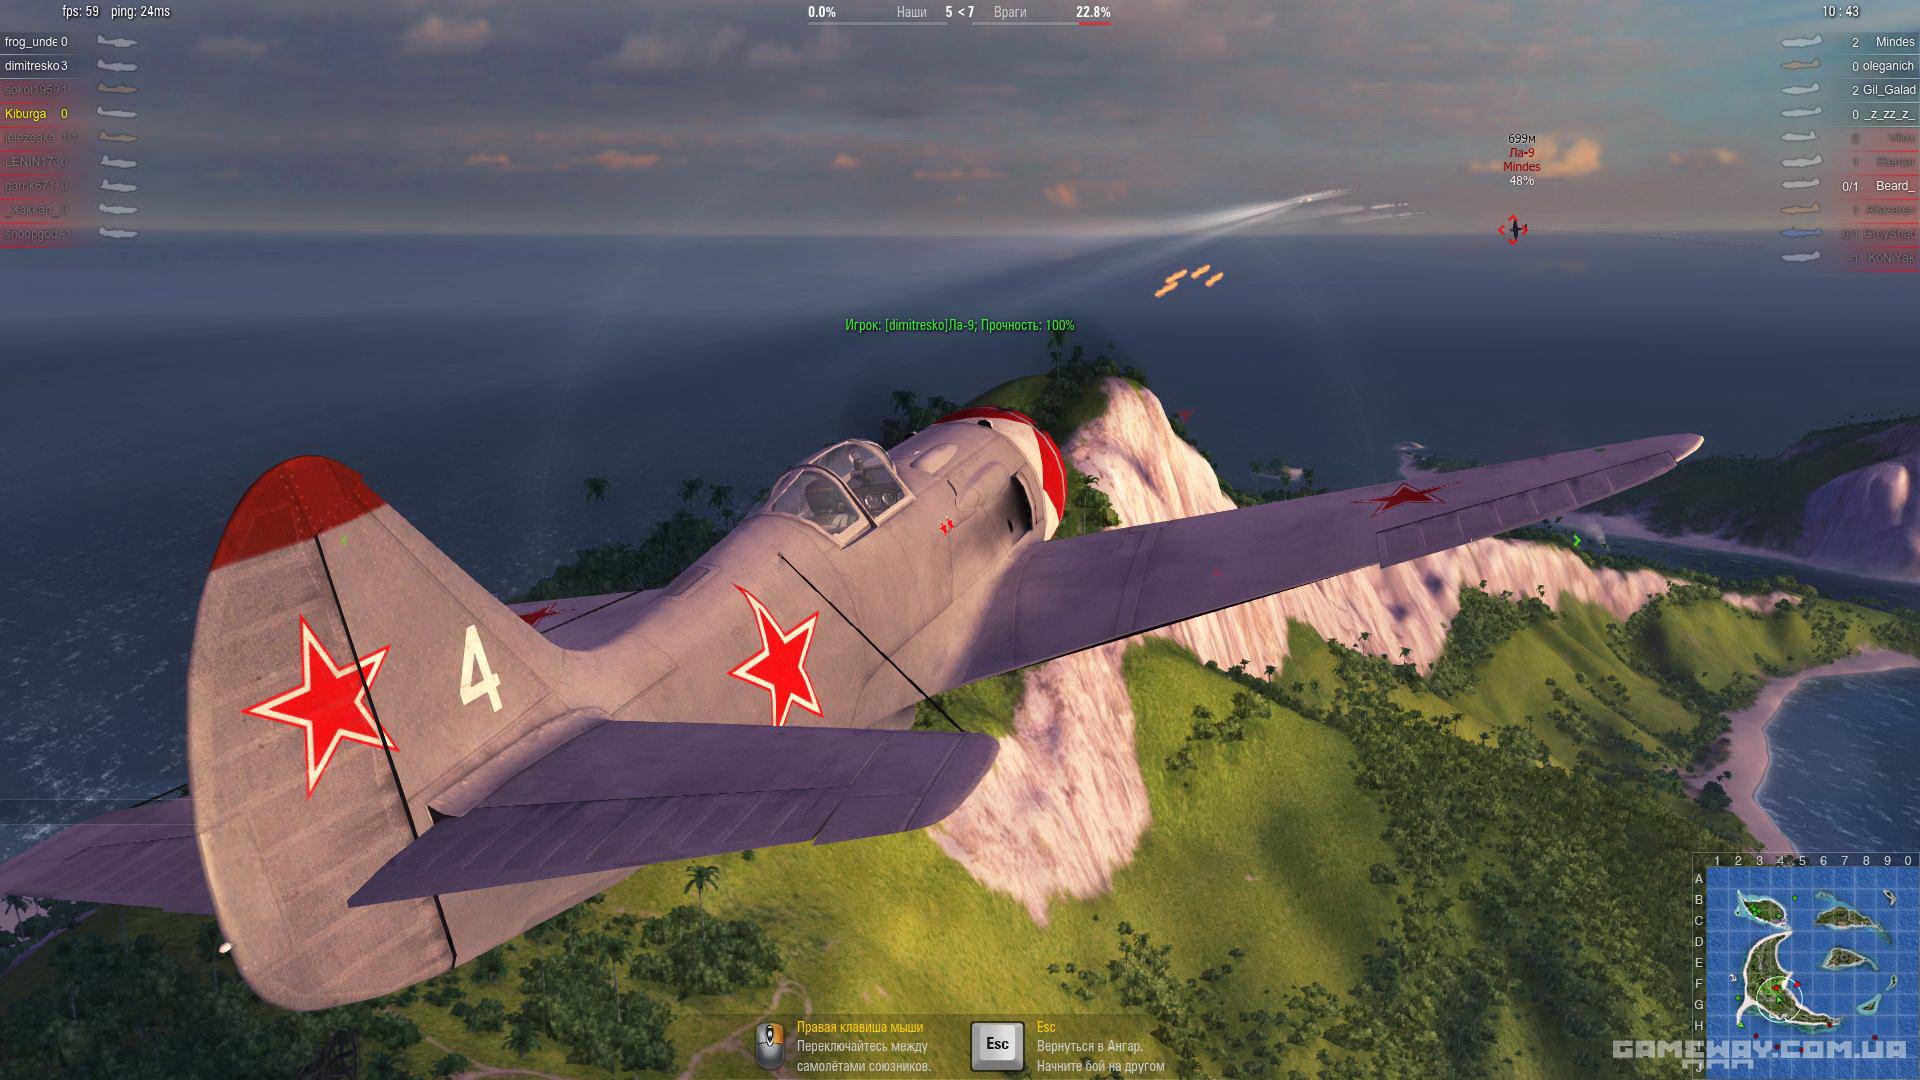 скриншоты геймплея worldofwarplanes збт